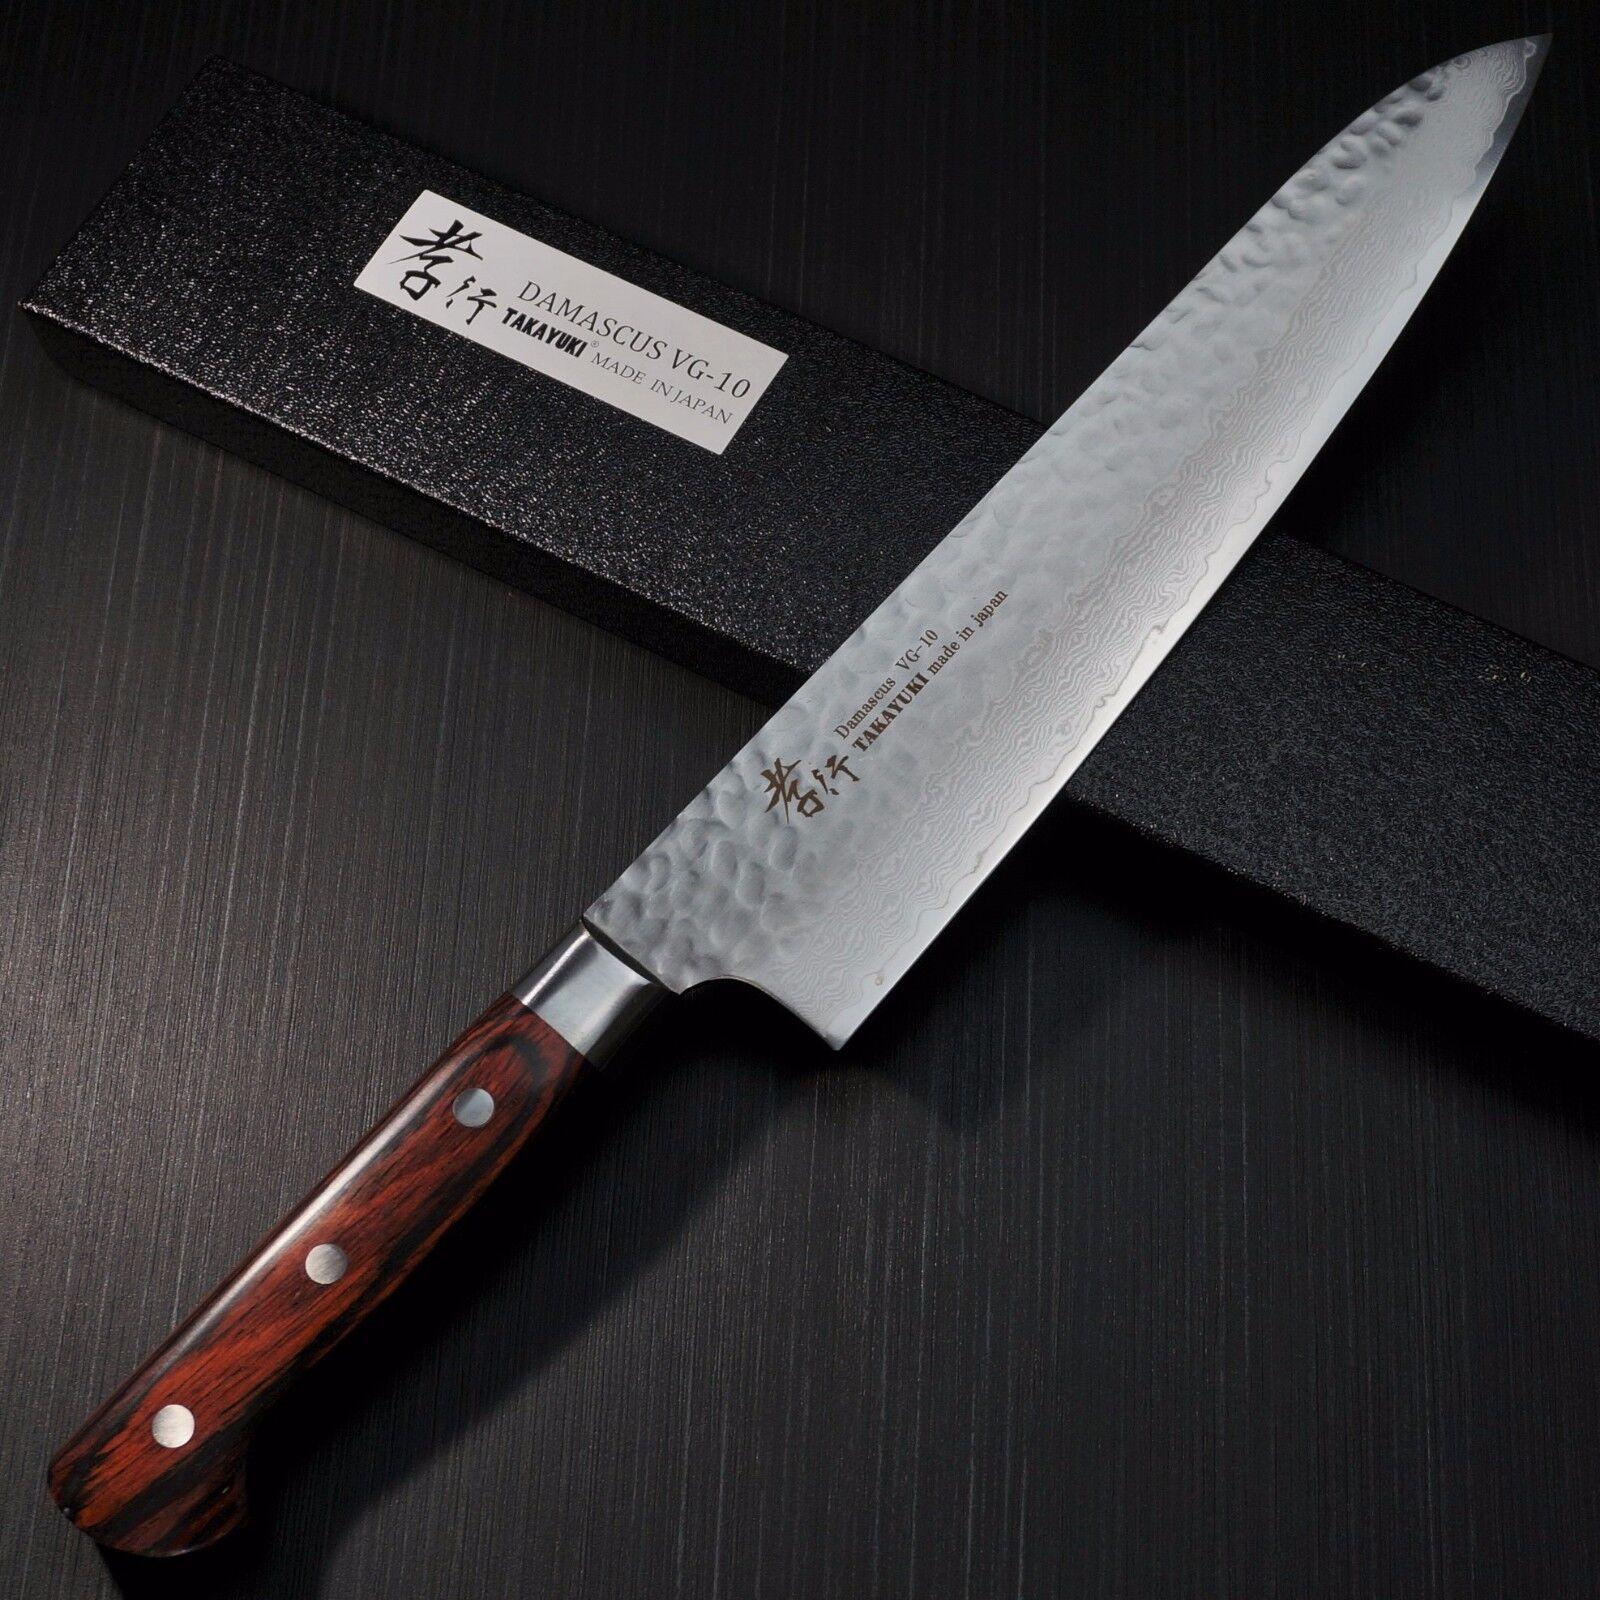 Japonais Sakai Takayuki martelé 33 COUCHES Damascus VG10 chef couteau 240 mm Japan